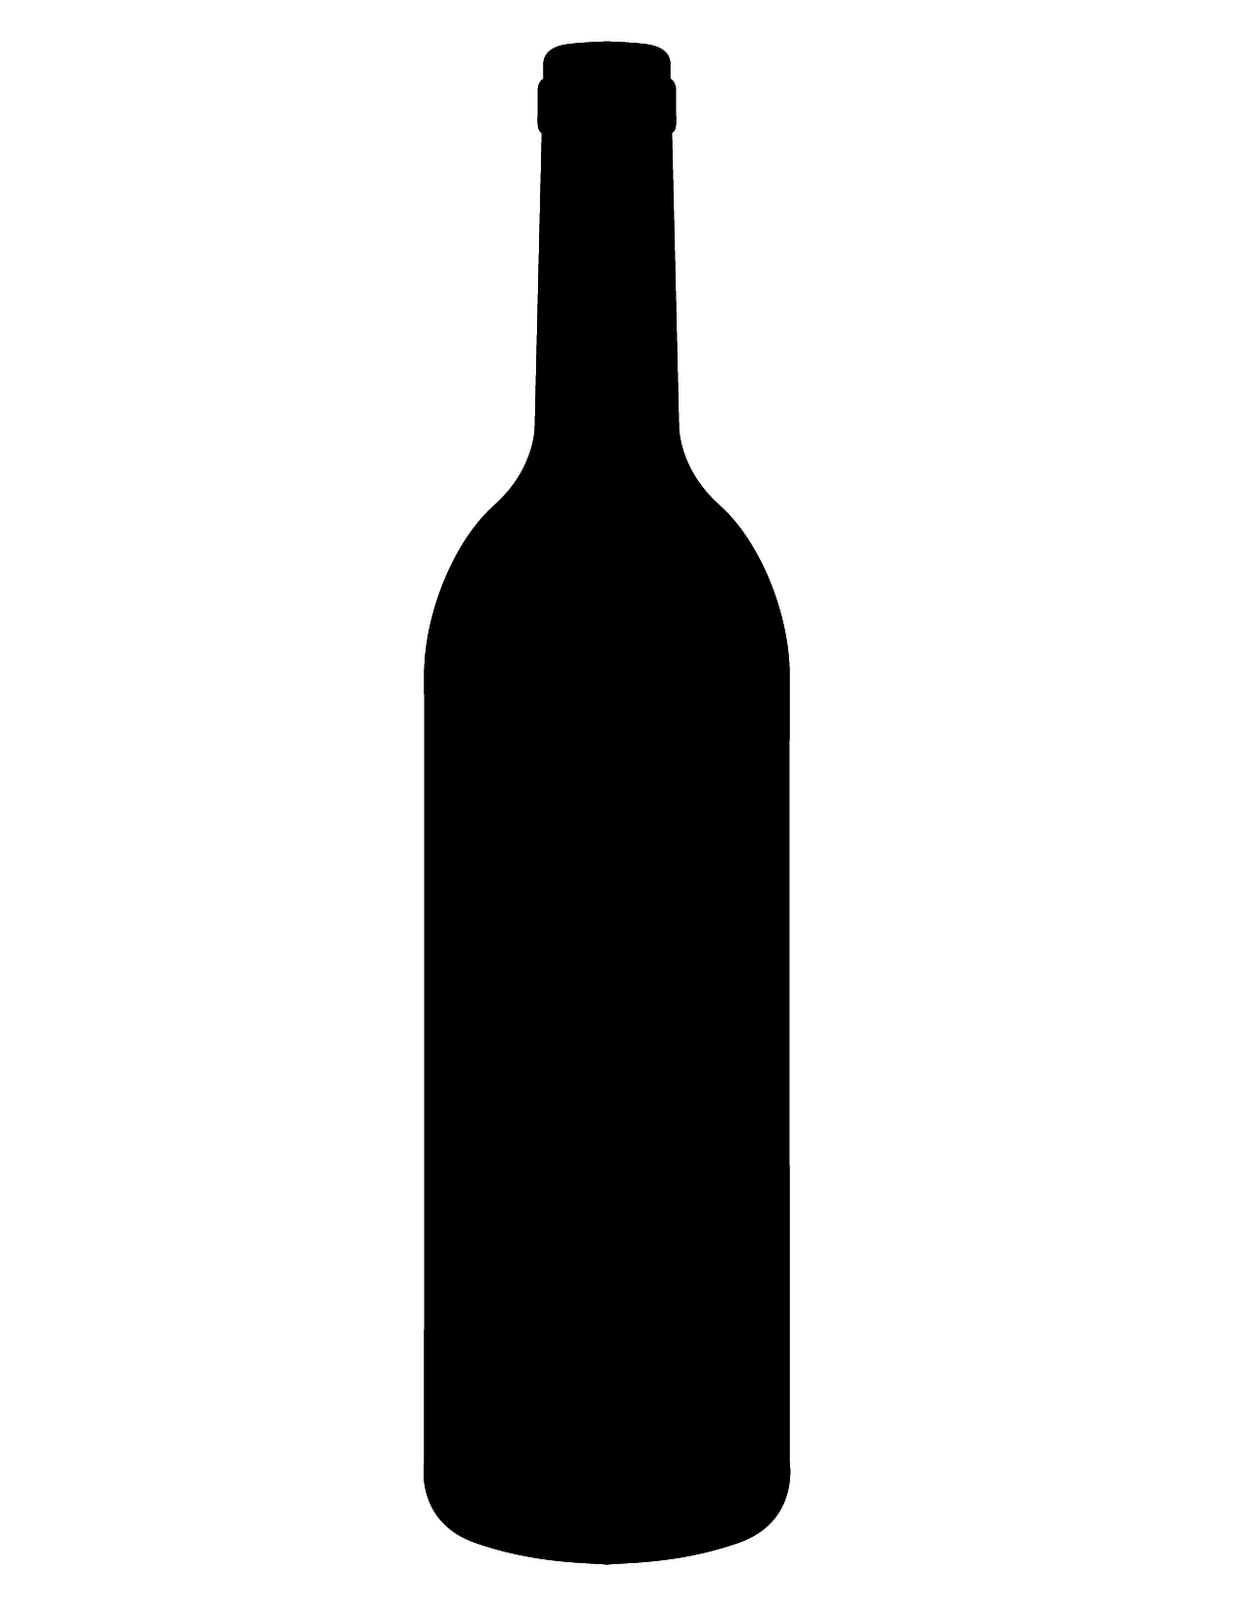 $20 Bottle (Vision Loss Alliance)